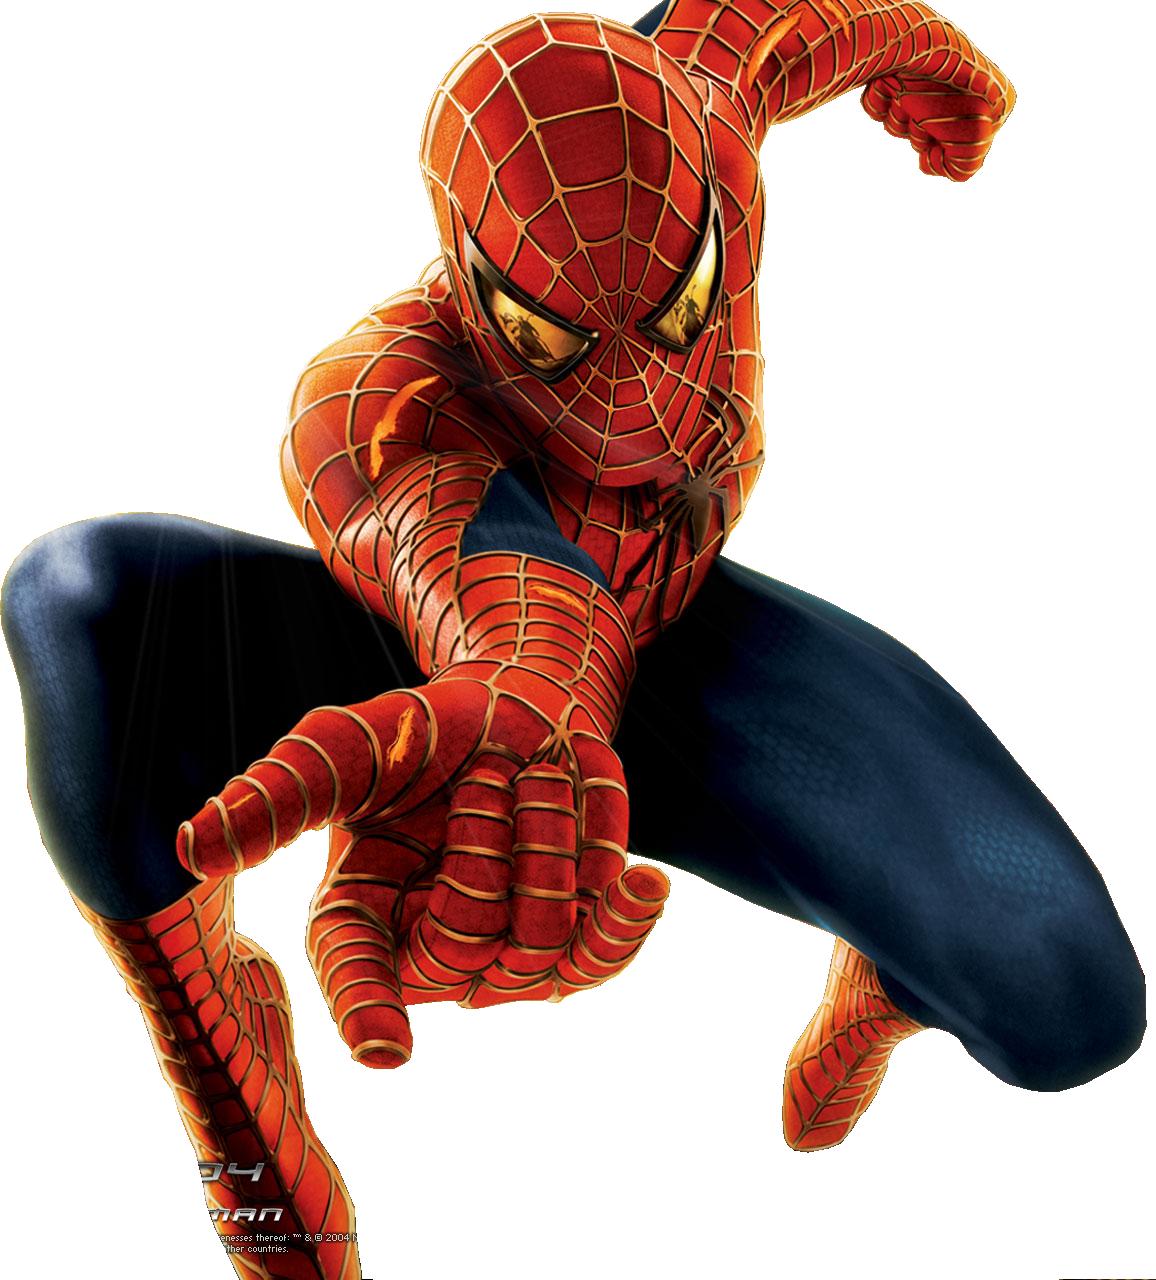 Image - Spiderman Killem.png - Students Wiki